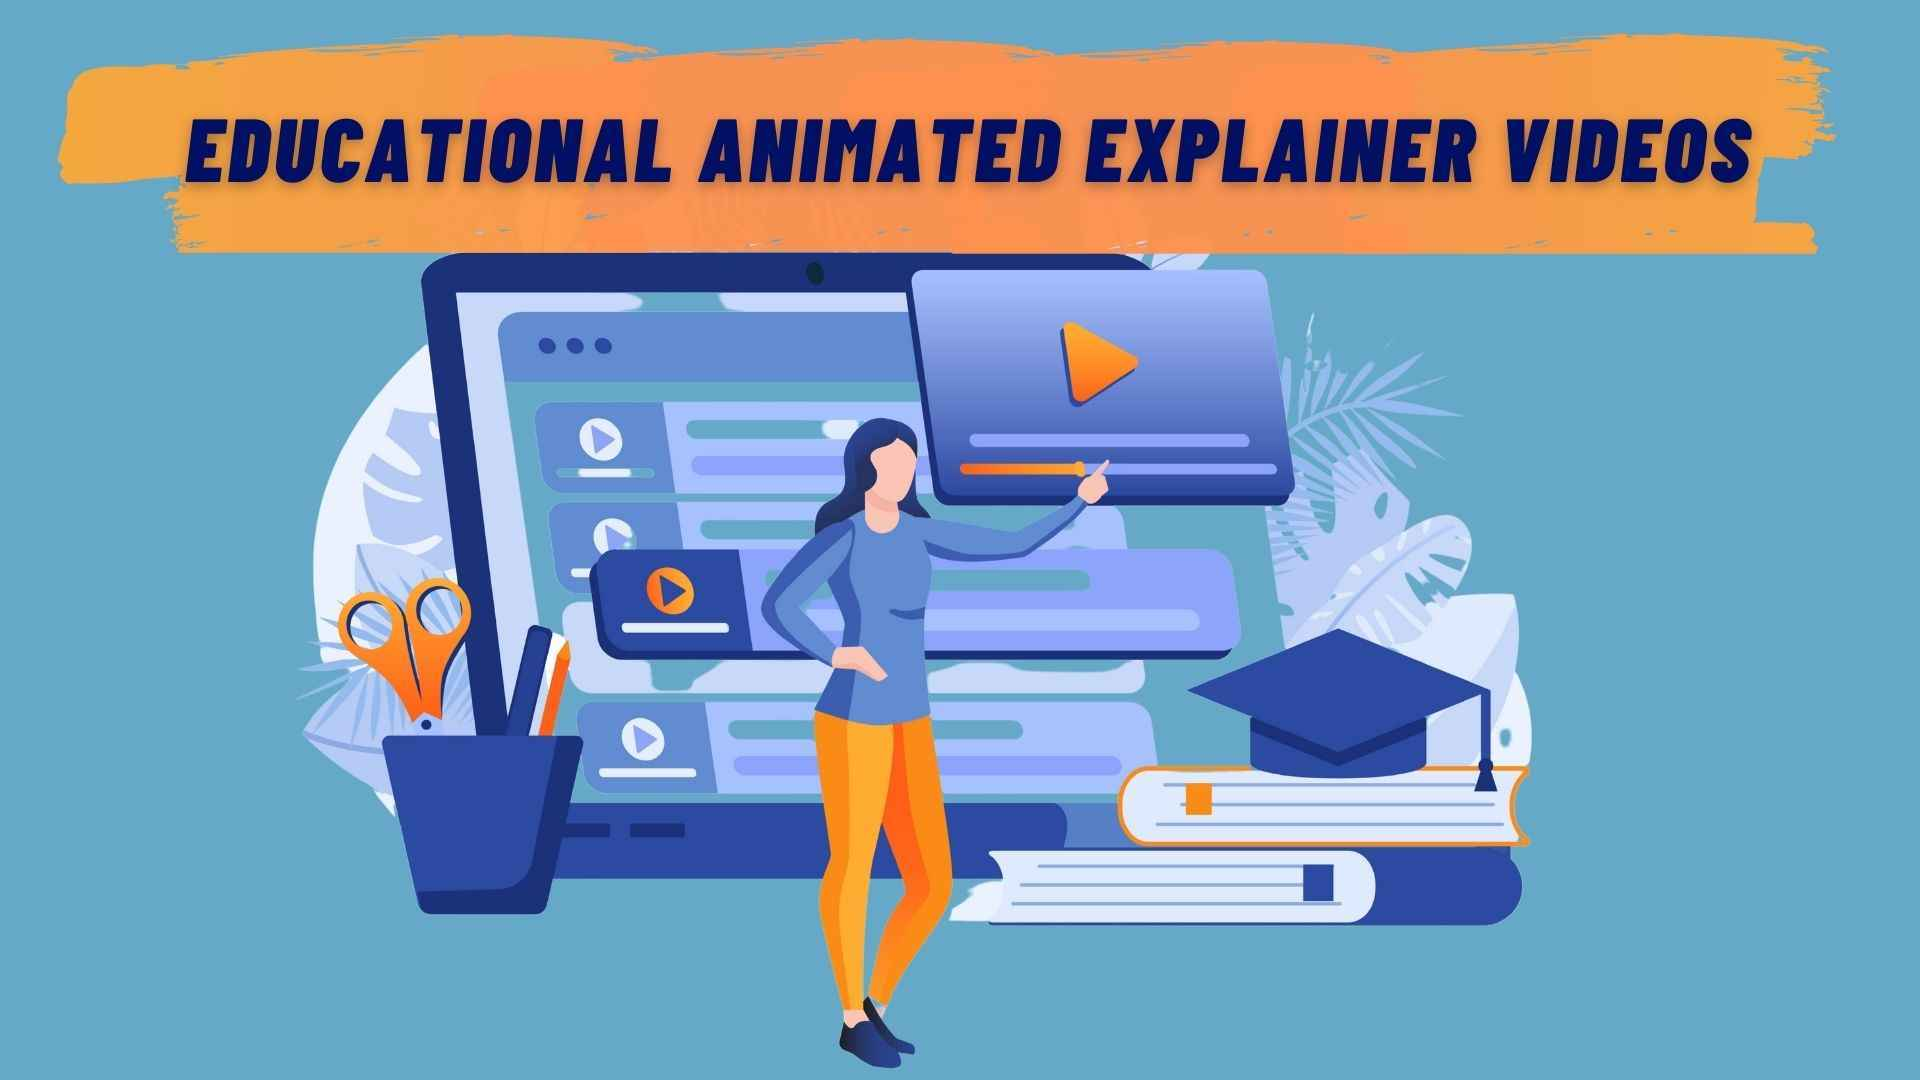 Educational Animated Explainer Videos